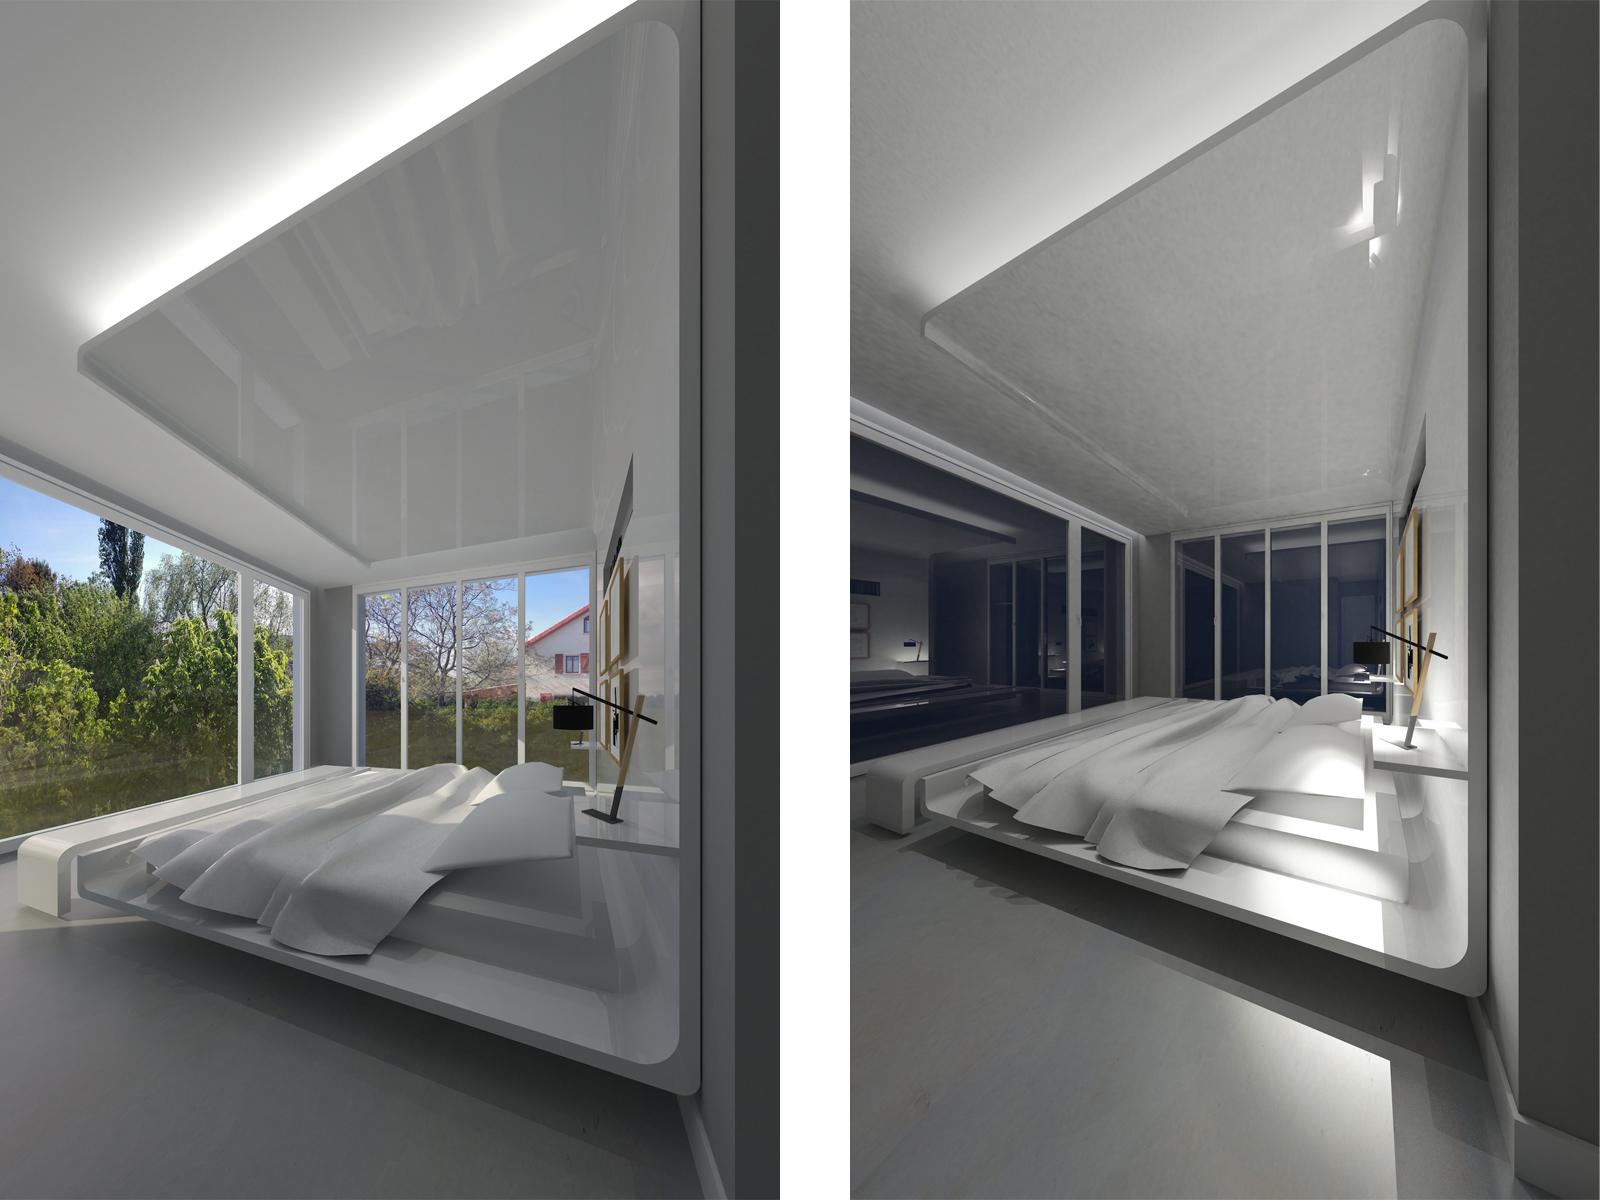 reforma dormitorio zaragoza